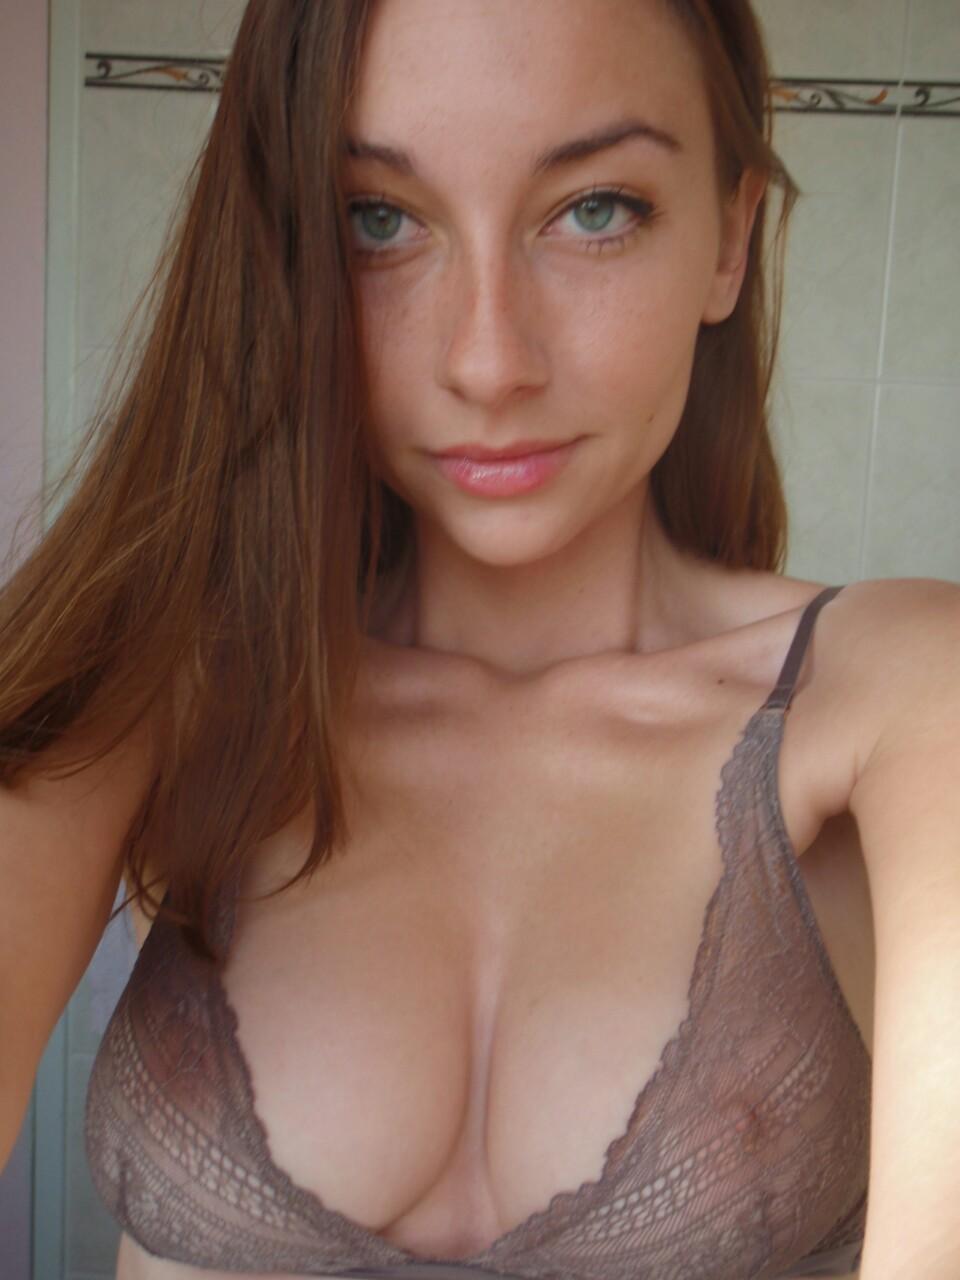 beautiful eyes porn photo - eporner